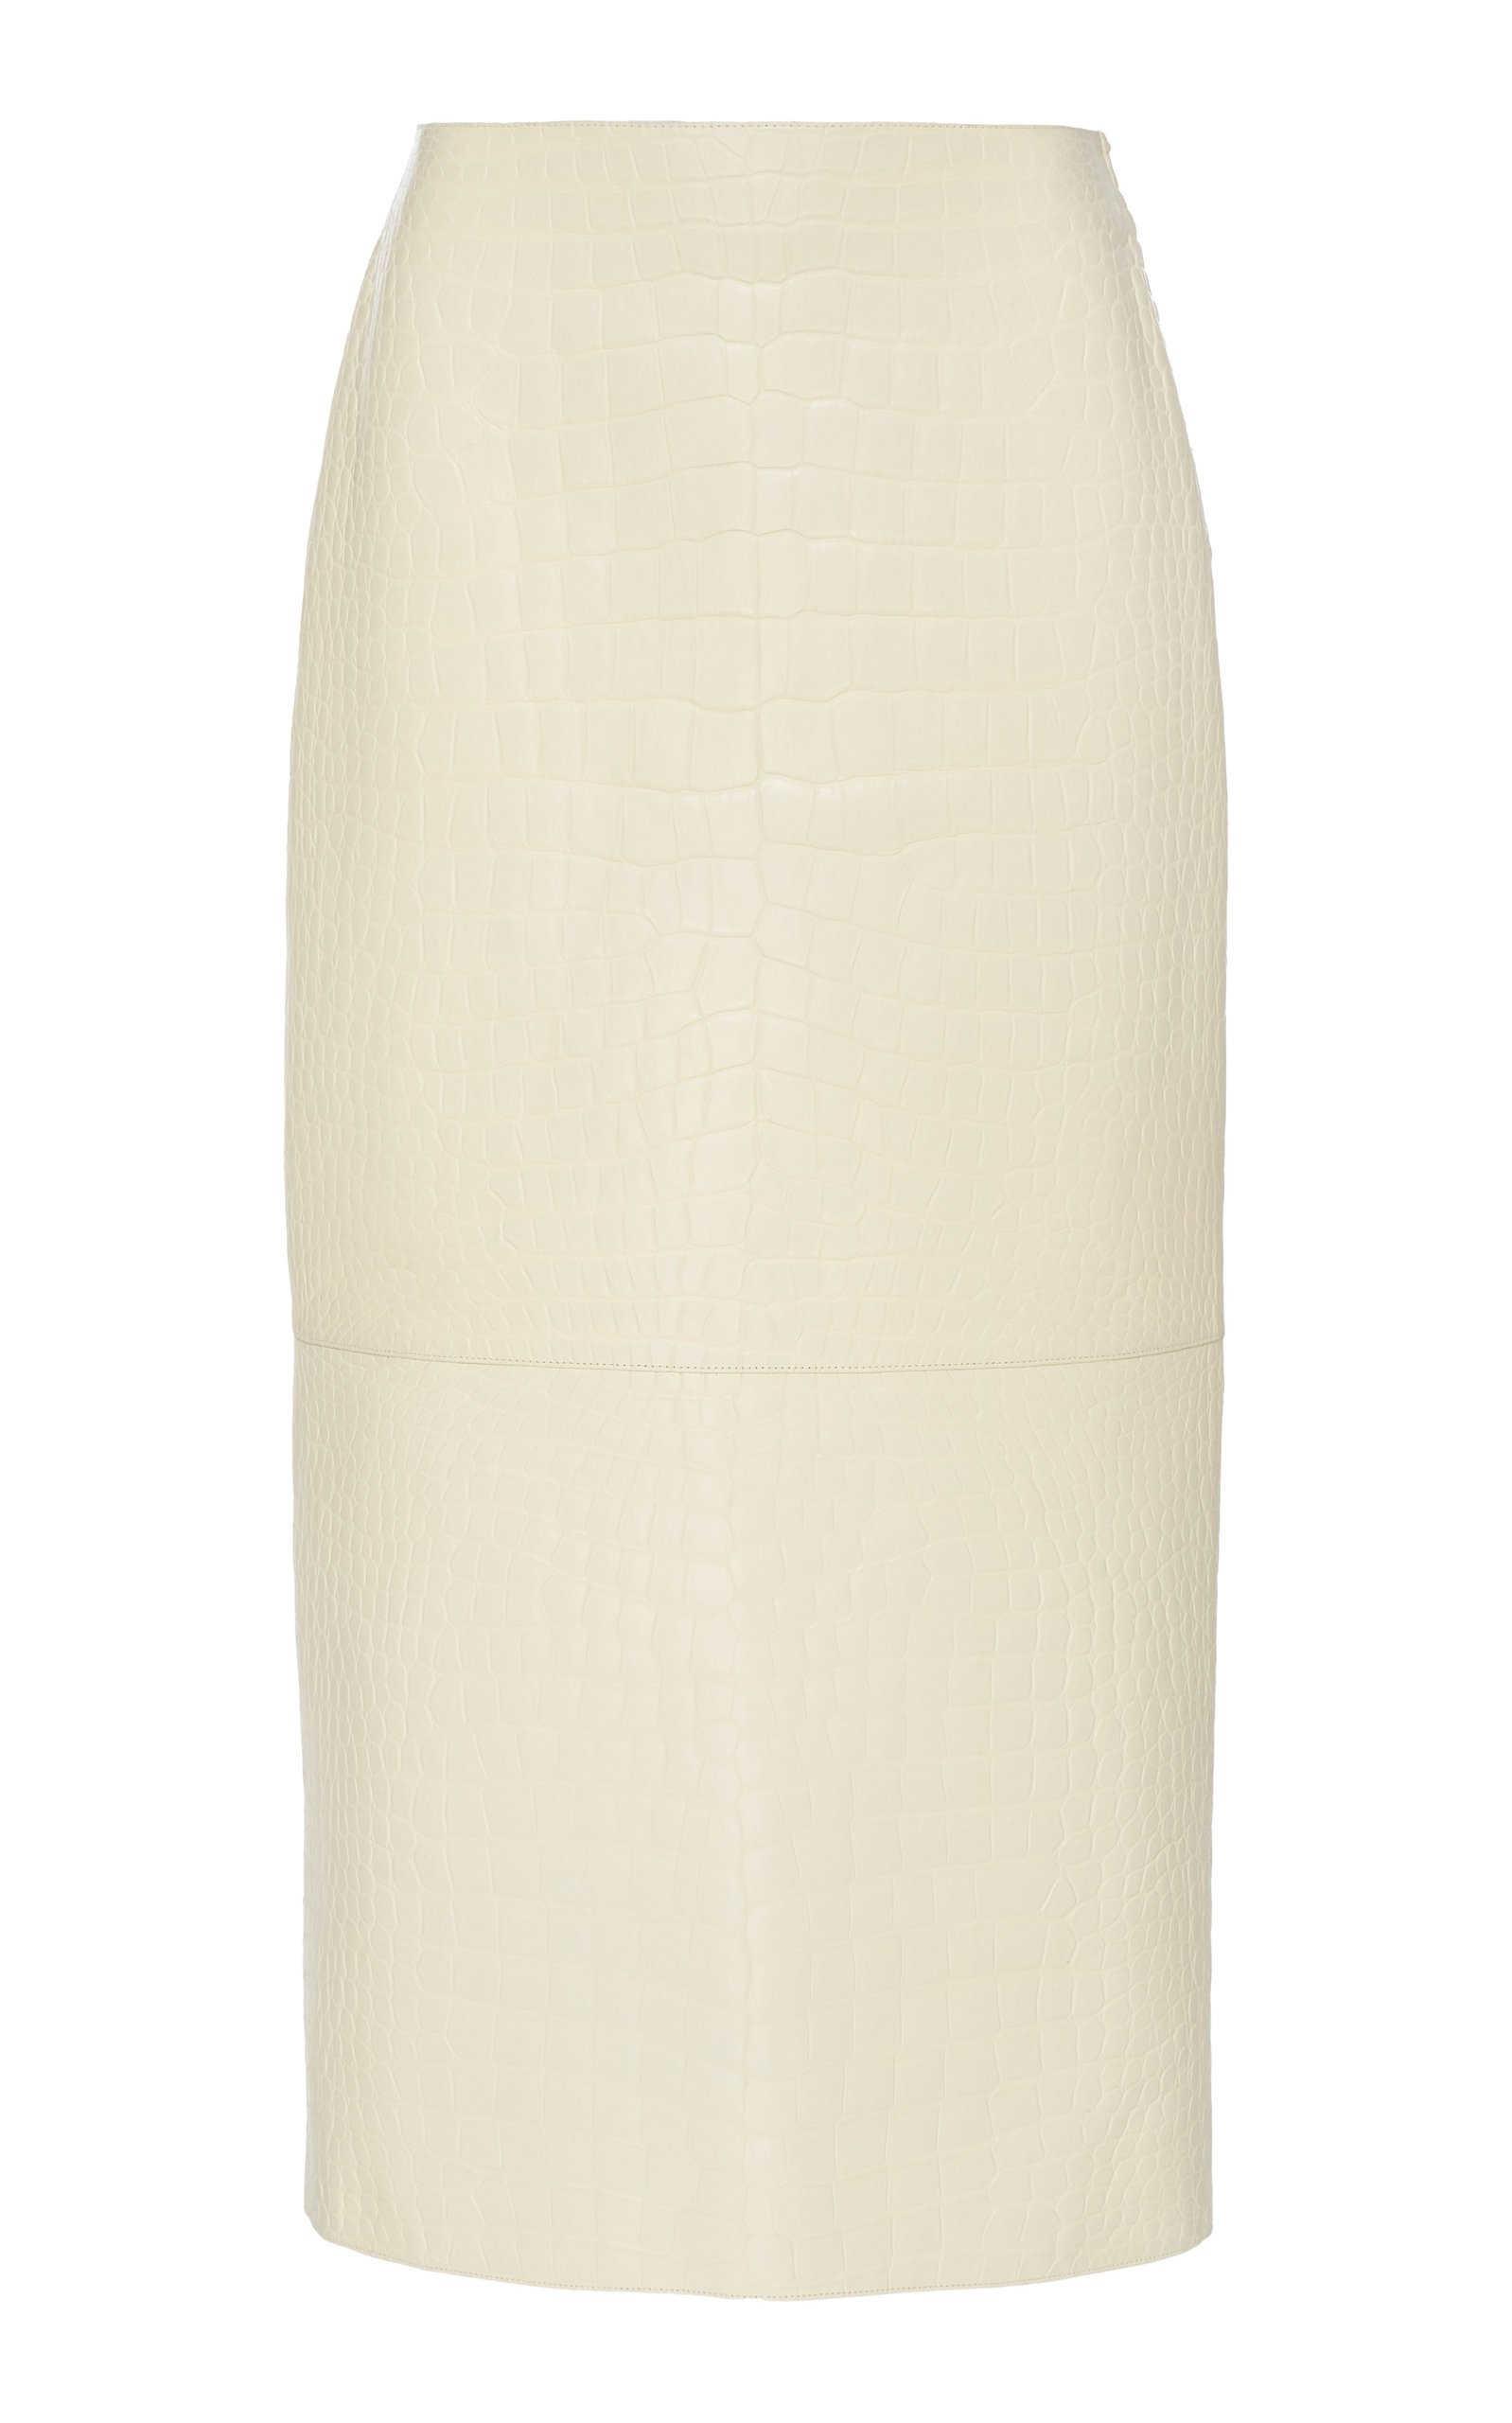 The Row Jenna Crocodile Midi Skirt Size: 10